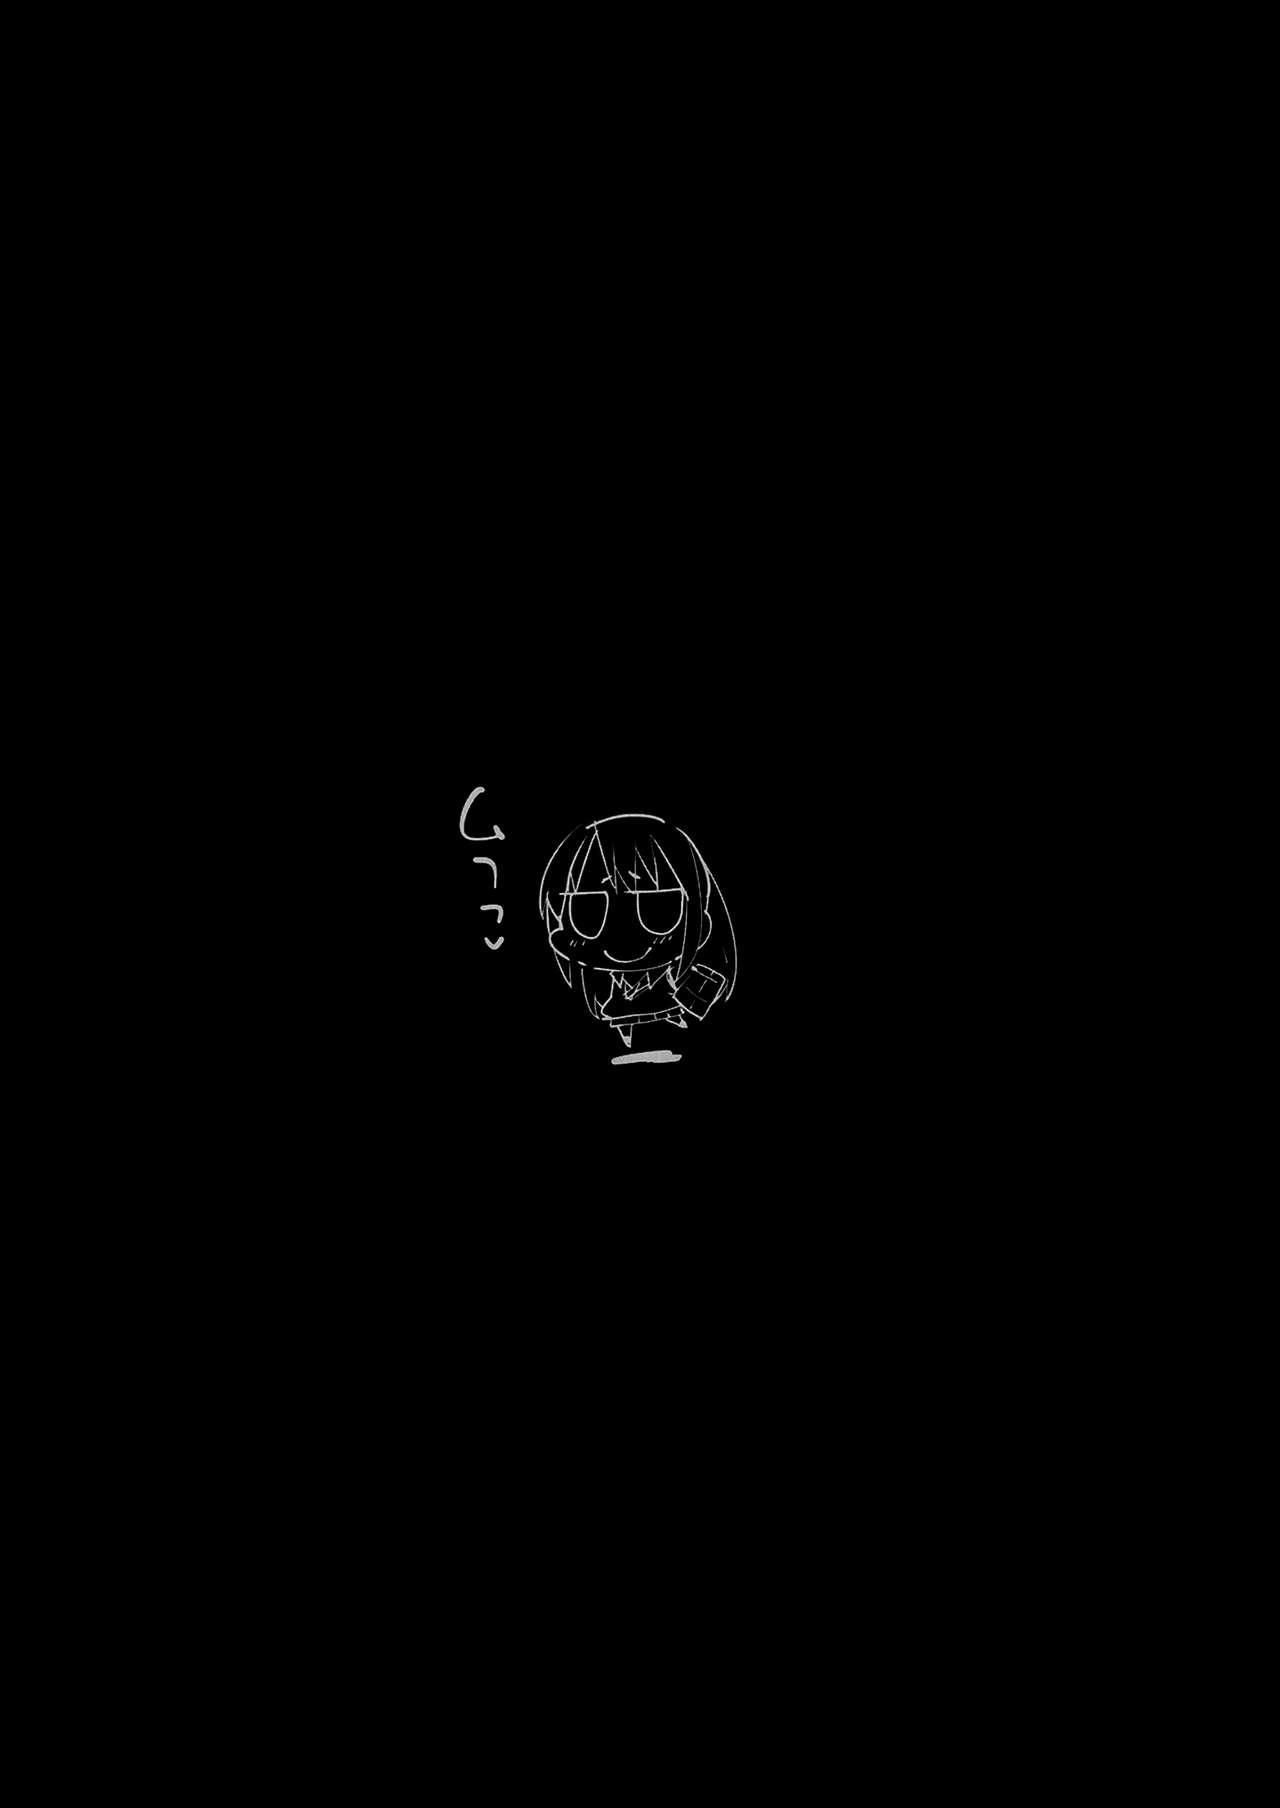 [Eromazun (Ma-kurou)] Shibuya Rin, Ochiru ~Ossan ga Shibuya Rin to Enkou Sex~   Shibuya Rin Falls ~An Old Guy Has Paid Sex With Shibuya Rin~ (THE IDOLM@STER CINDERELLA GIRLS) [English] [B.E.C. Scans] [Digital] 31